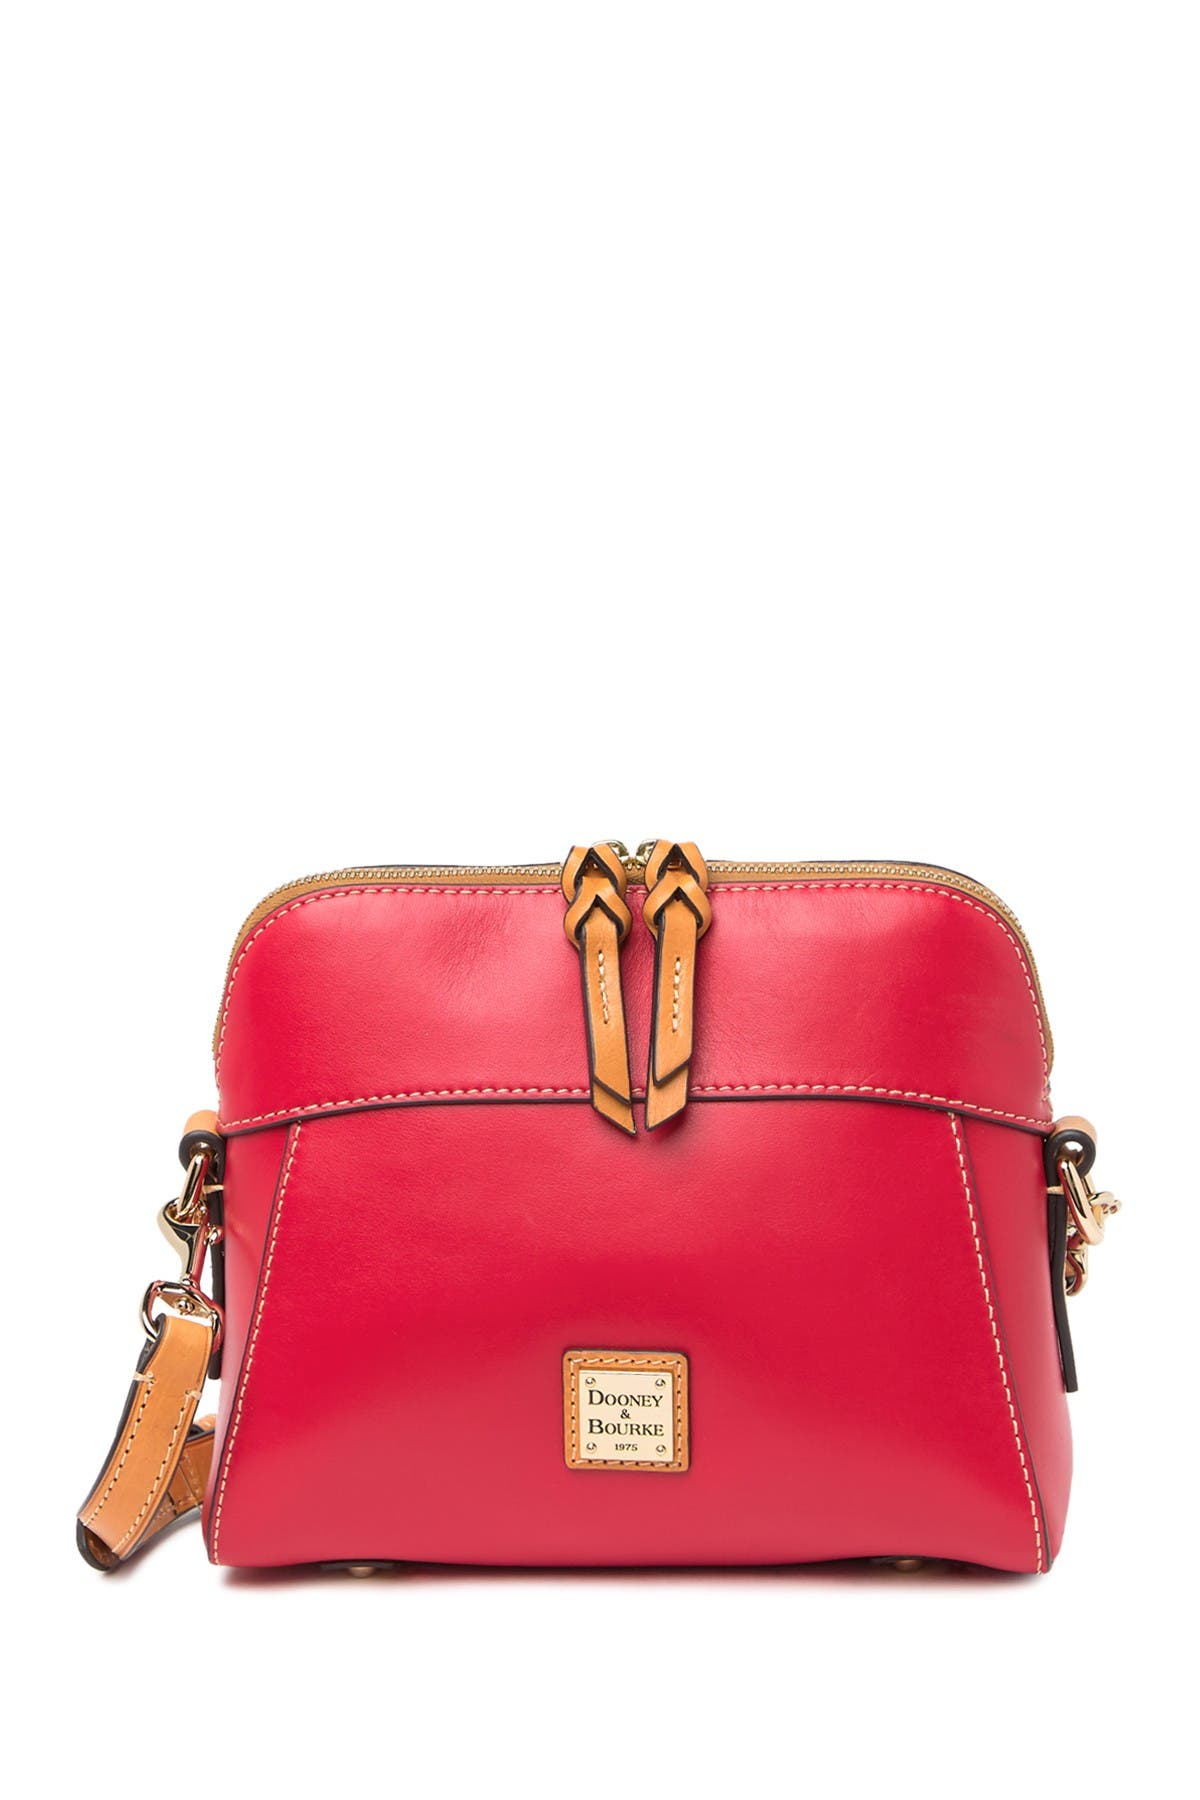 Image of Dooney & Bourke Cameron Leather Crossbody Bag